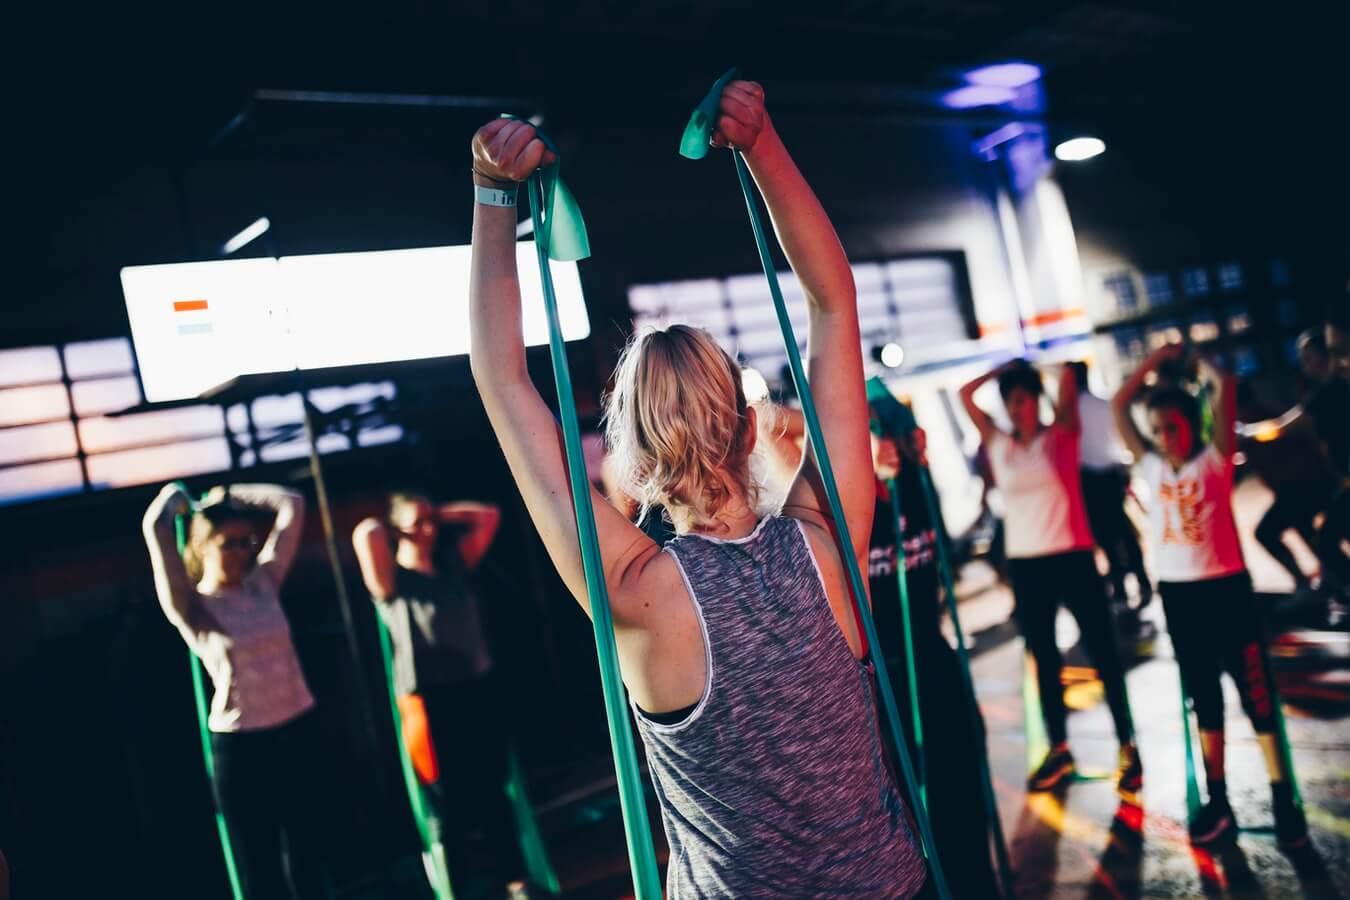 Фитнес клуб, музыка для фитнес клуба, музыка для спорта